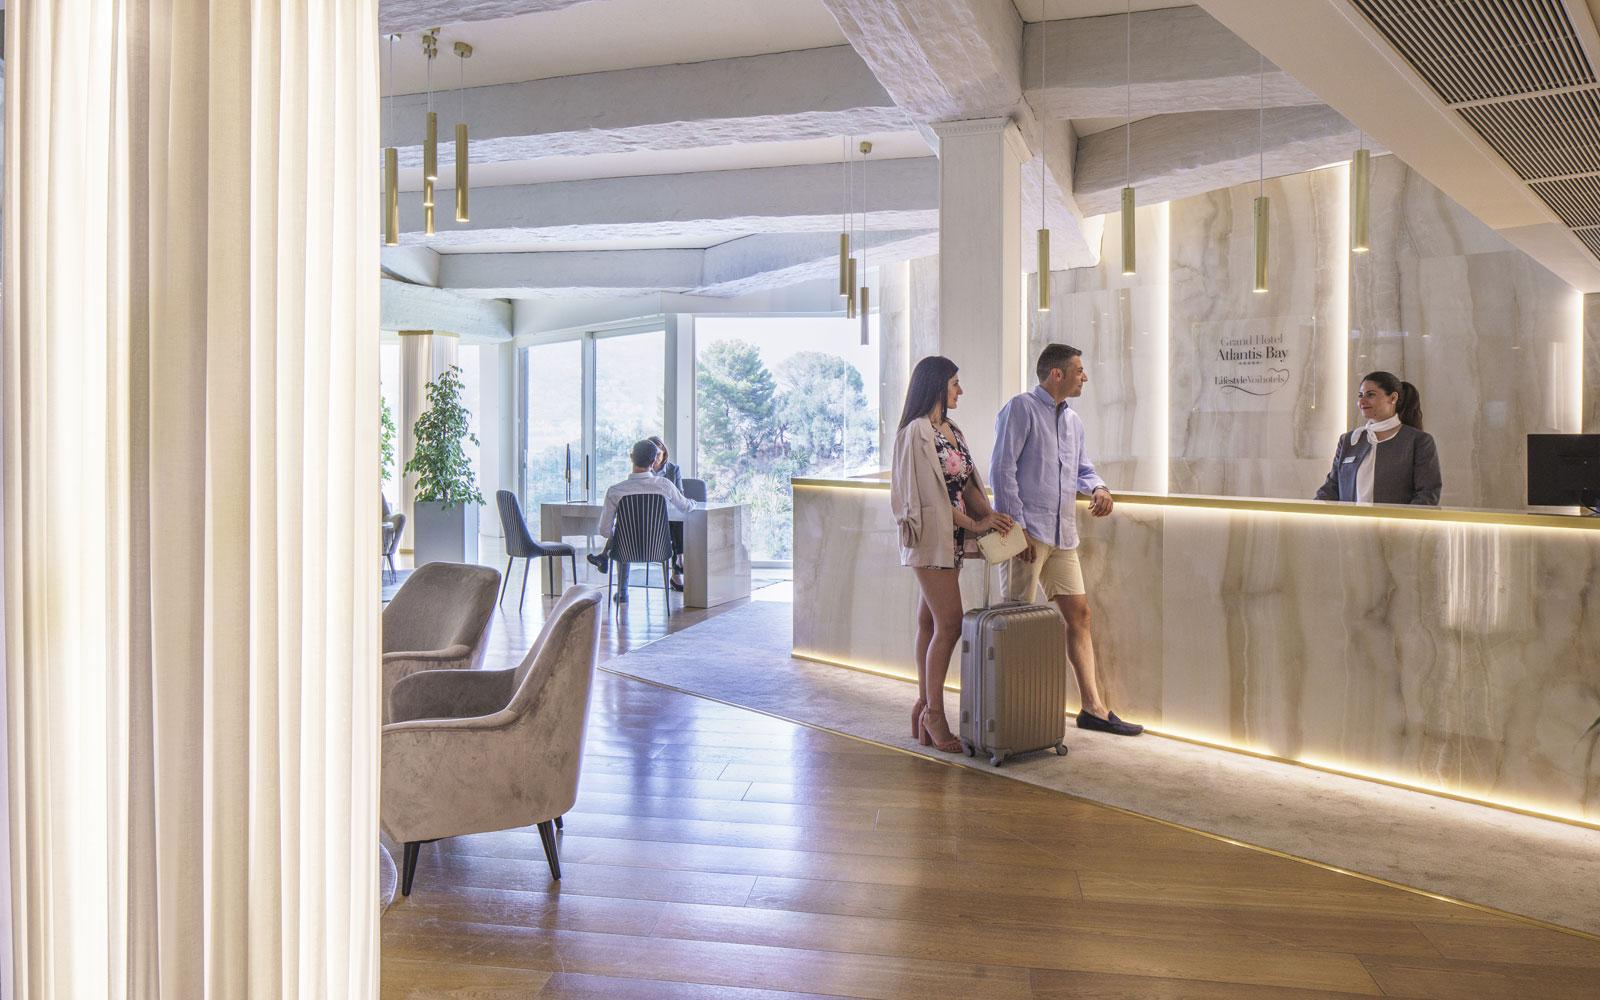 Reception at Grand Hotel Atlantis Bay